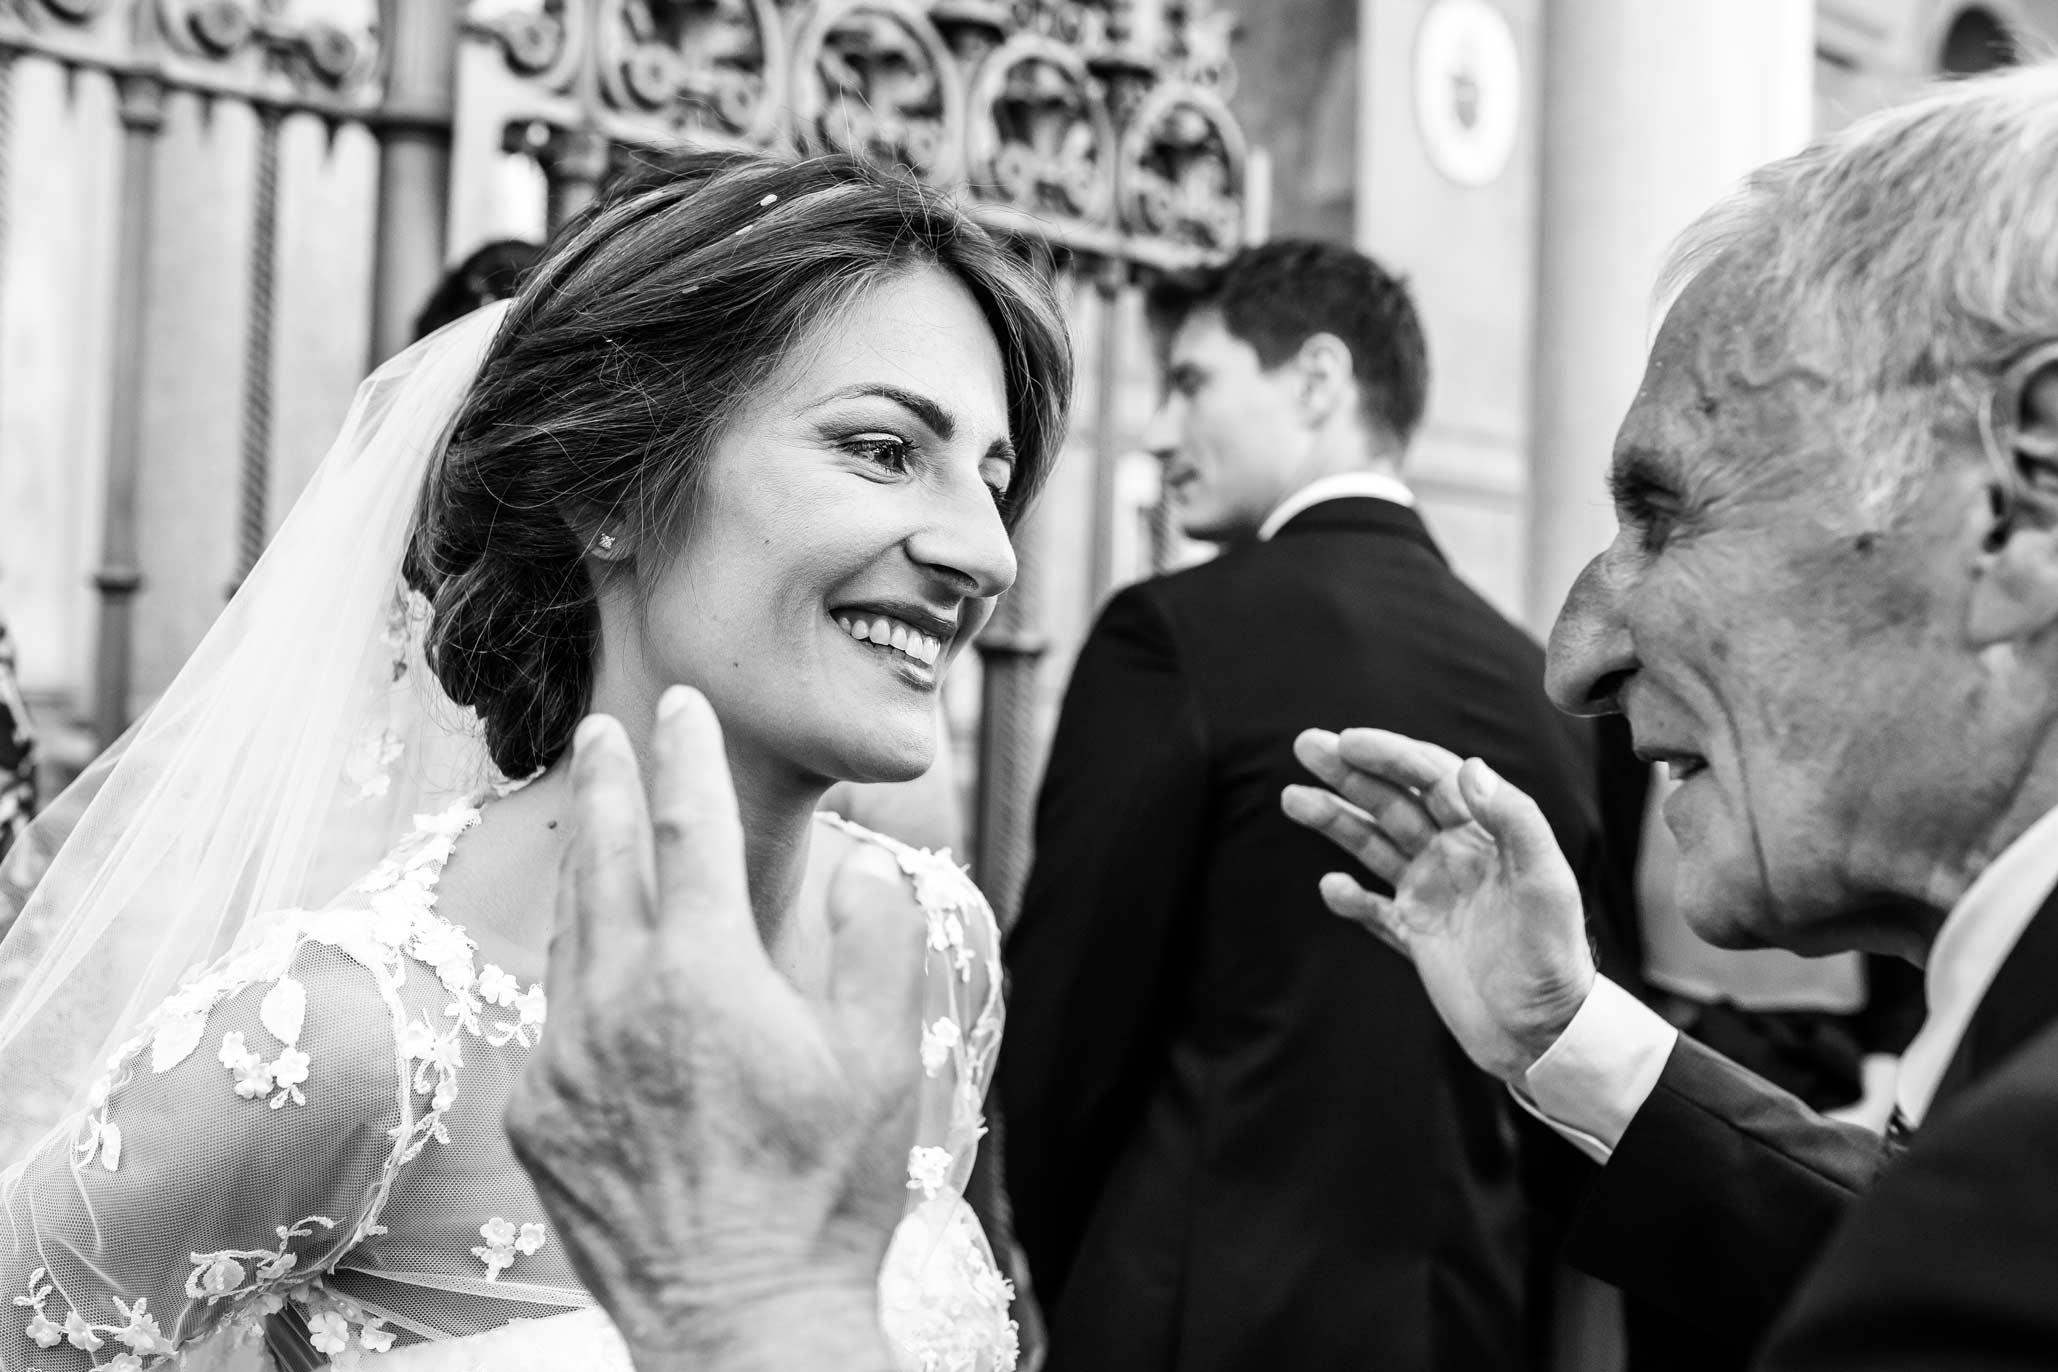 Fotografo-Stile-Reportage-Matrimonio-Cerimonia